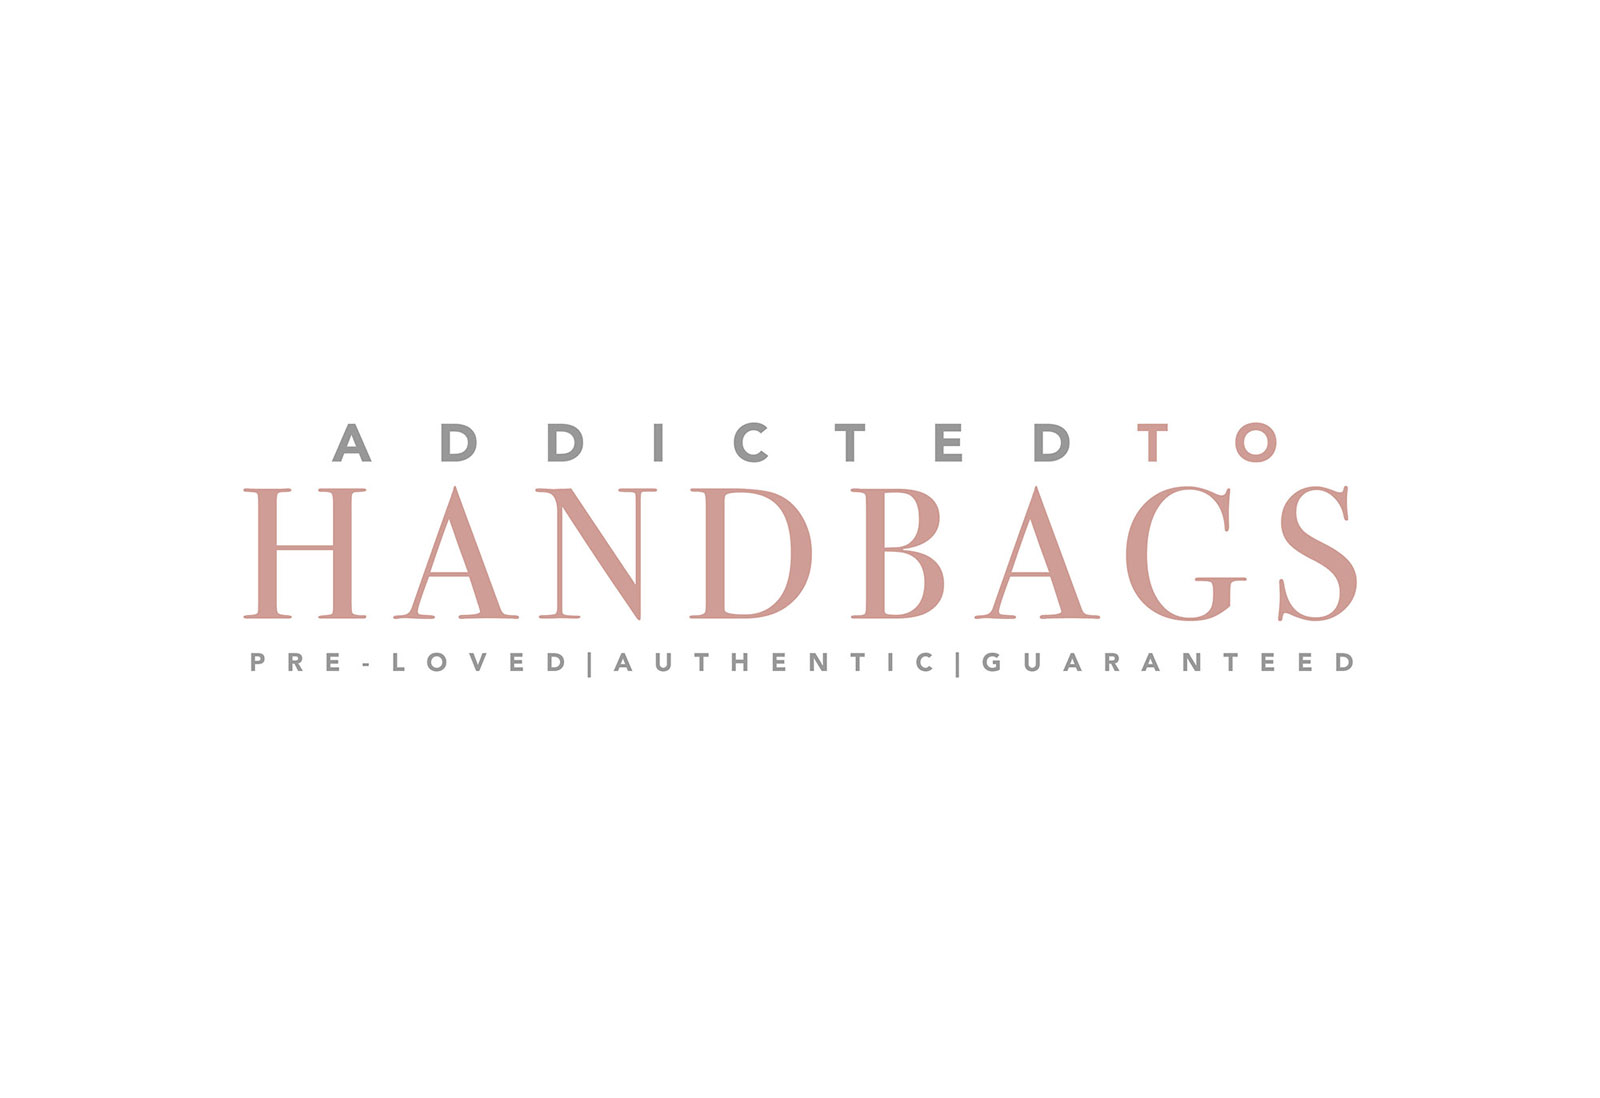 Developed Concept v2 - Addicted to Handbags